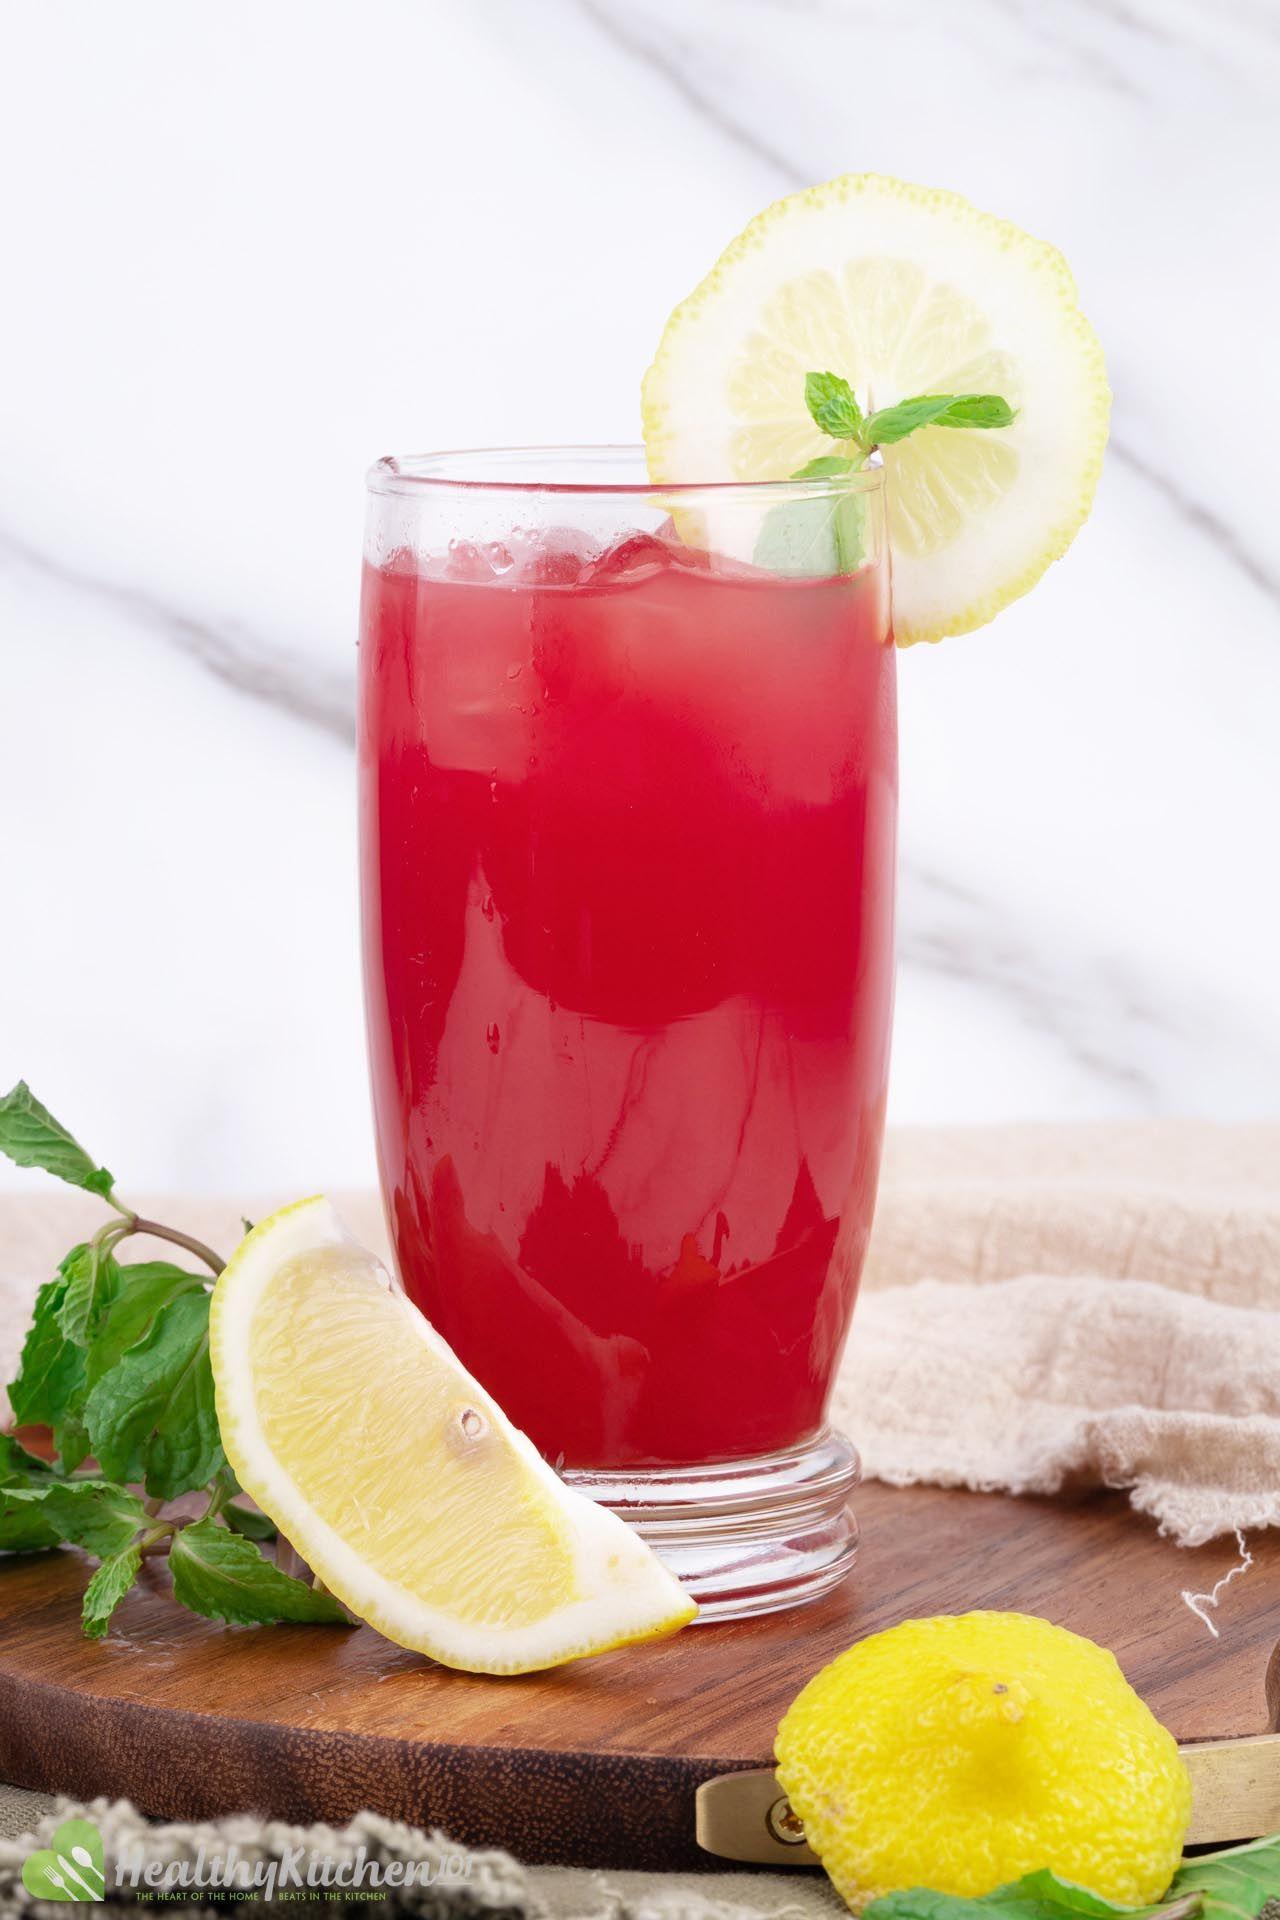 How to Make Watermelon Juice and Lemon